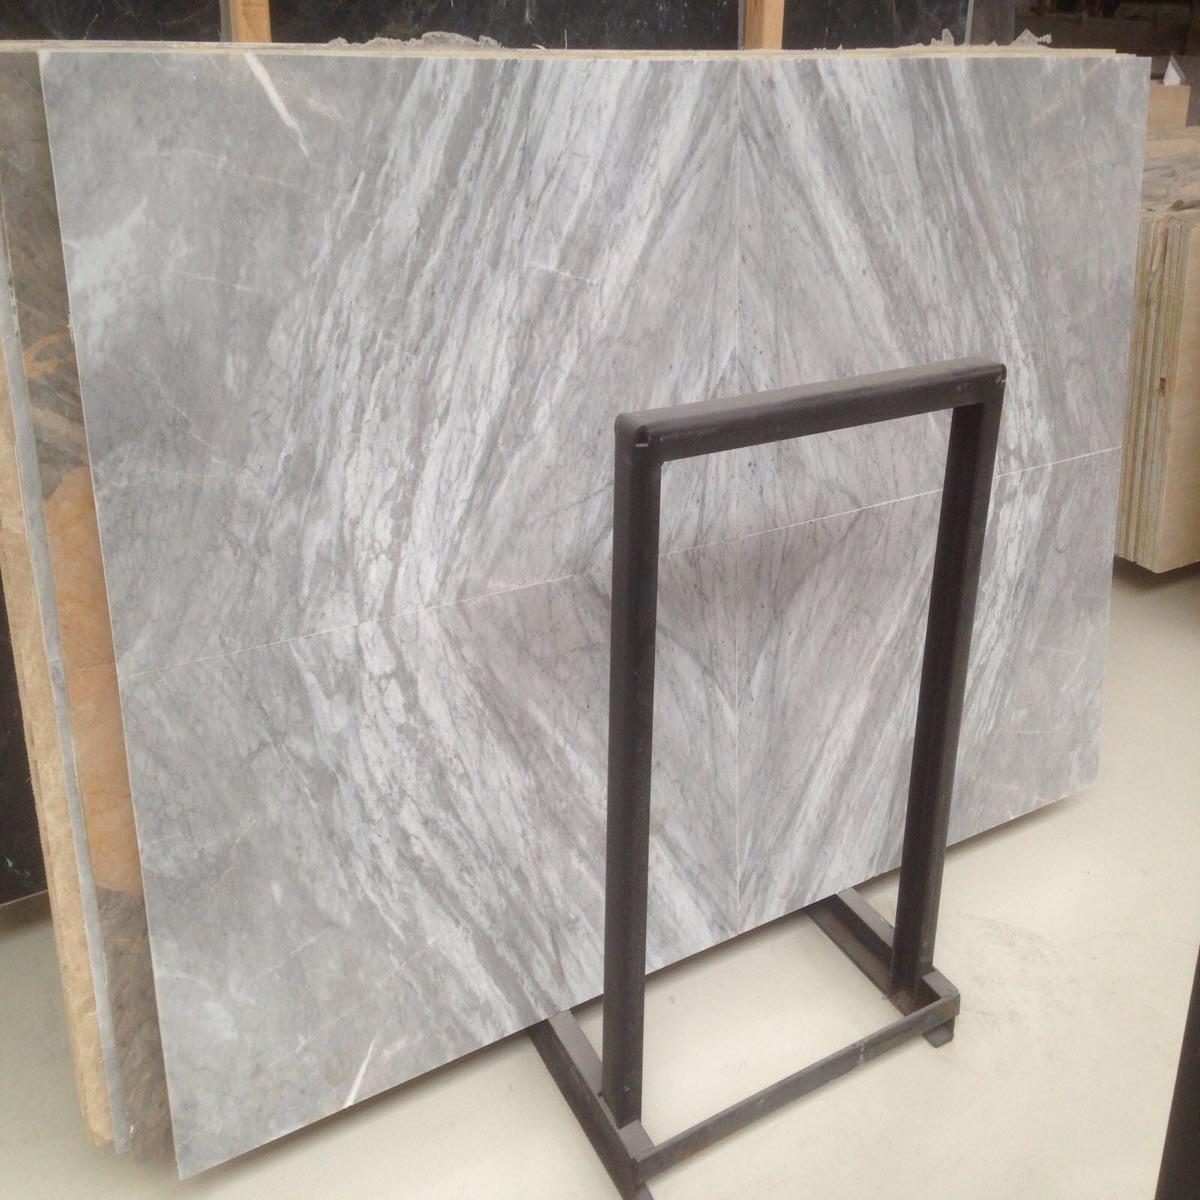 Aegen gray marble slabs